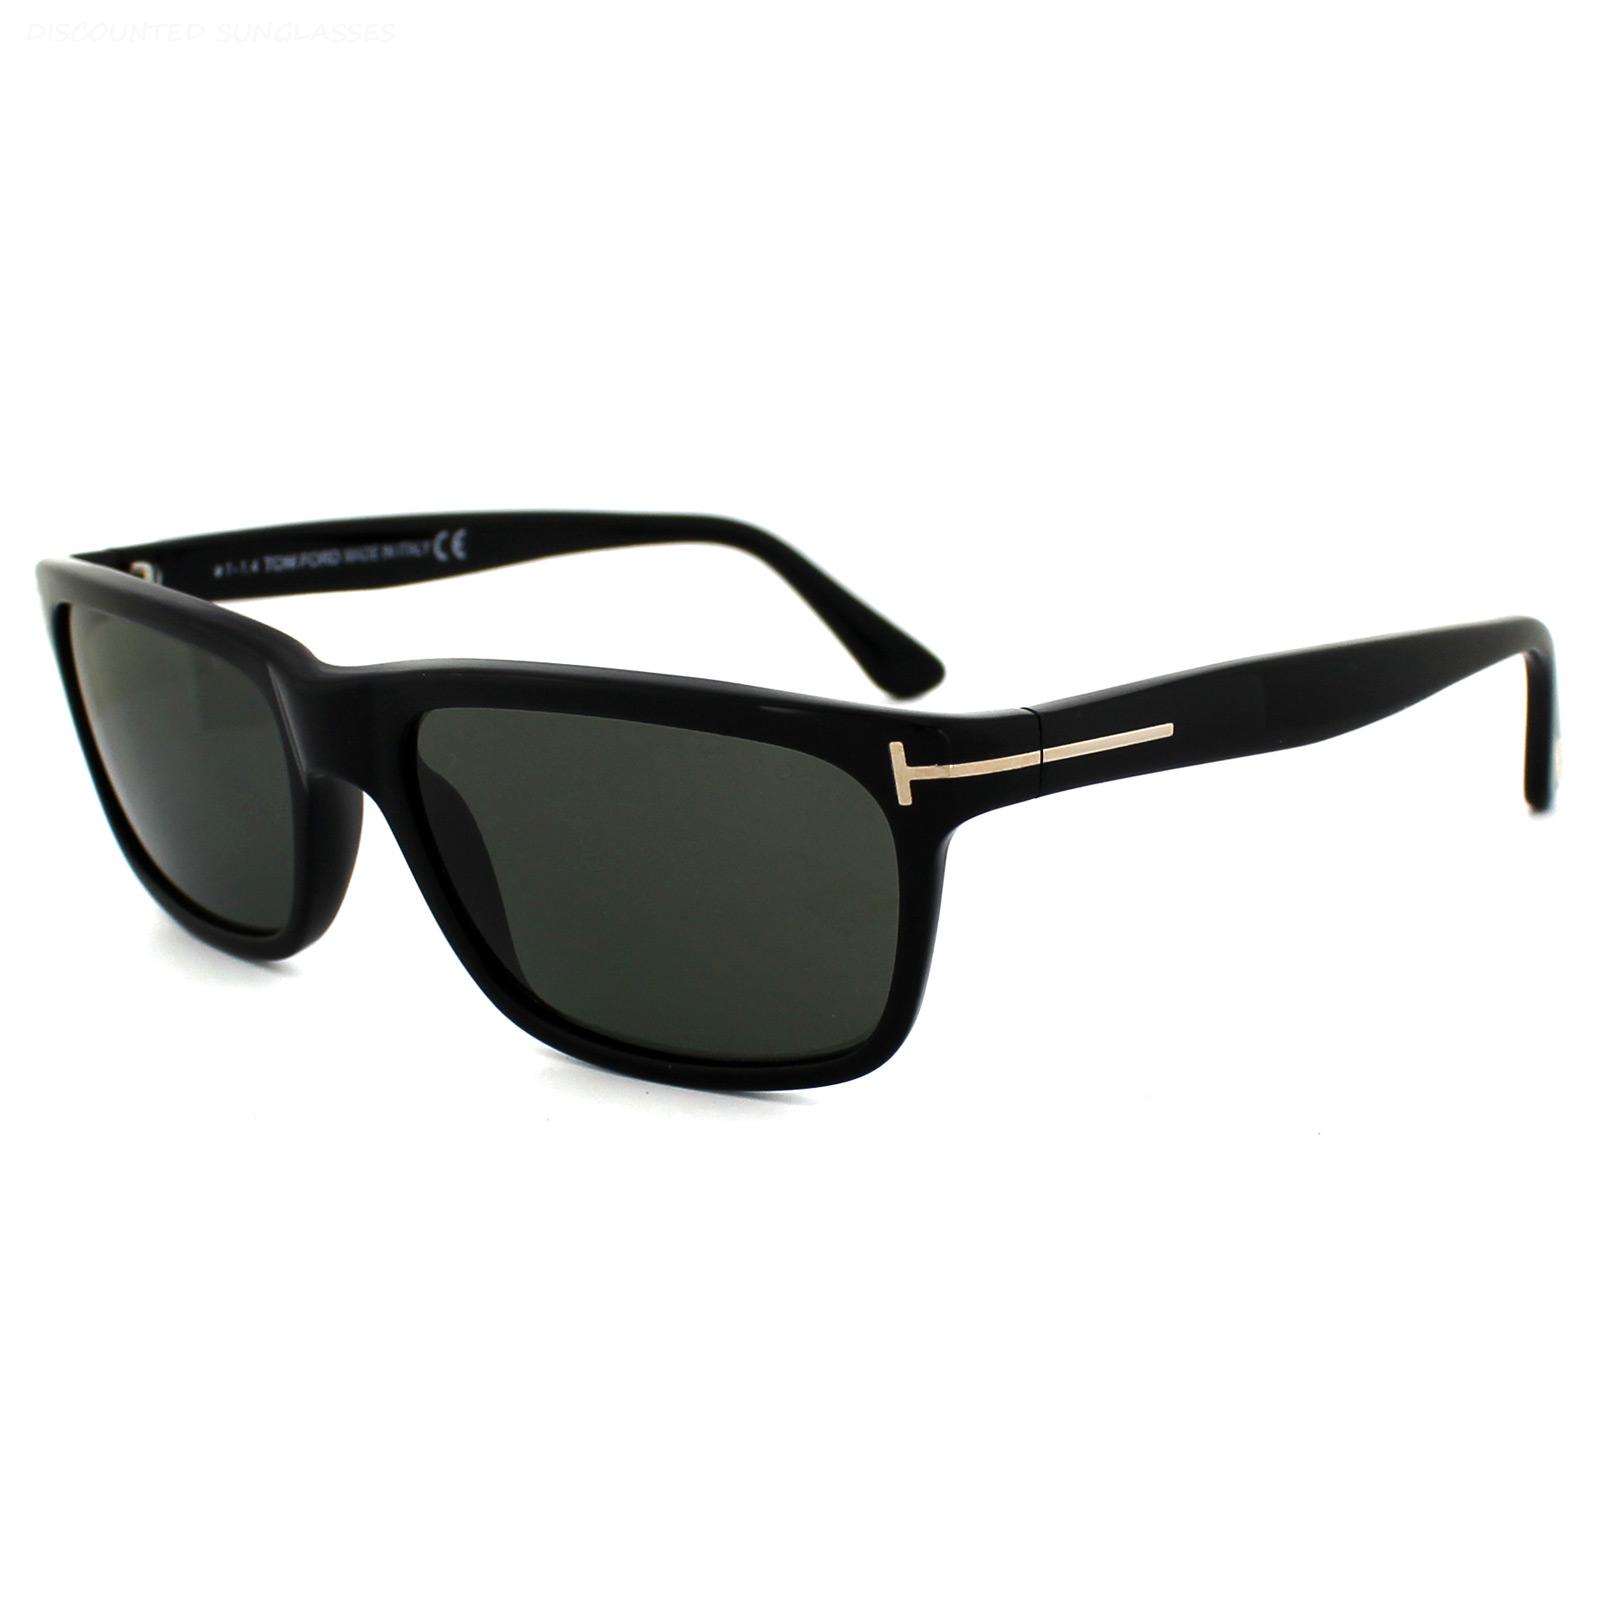 39b268967f Sentinel Tom Ford Sunglasses 0337 Hugh 01N Shiny Black Green Polarized